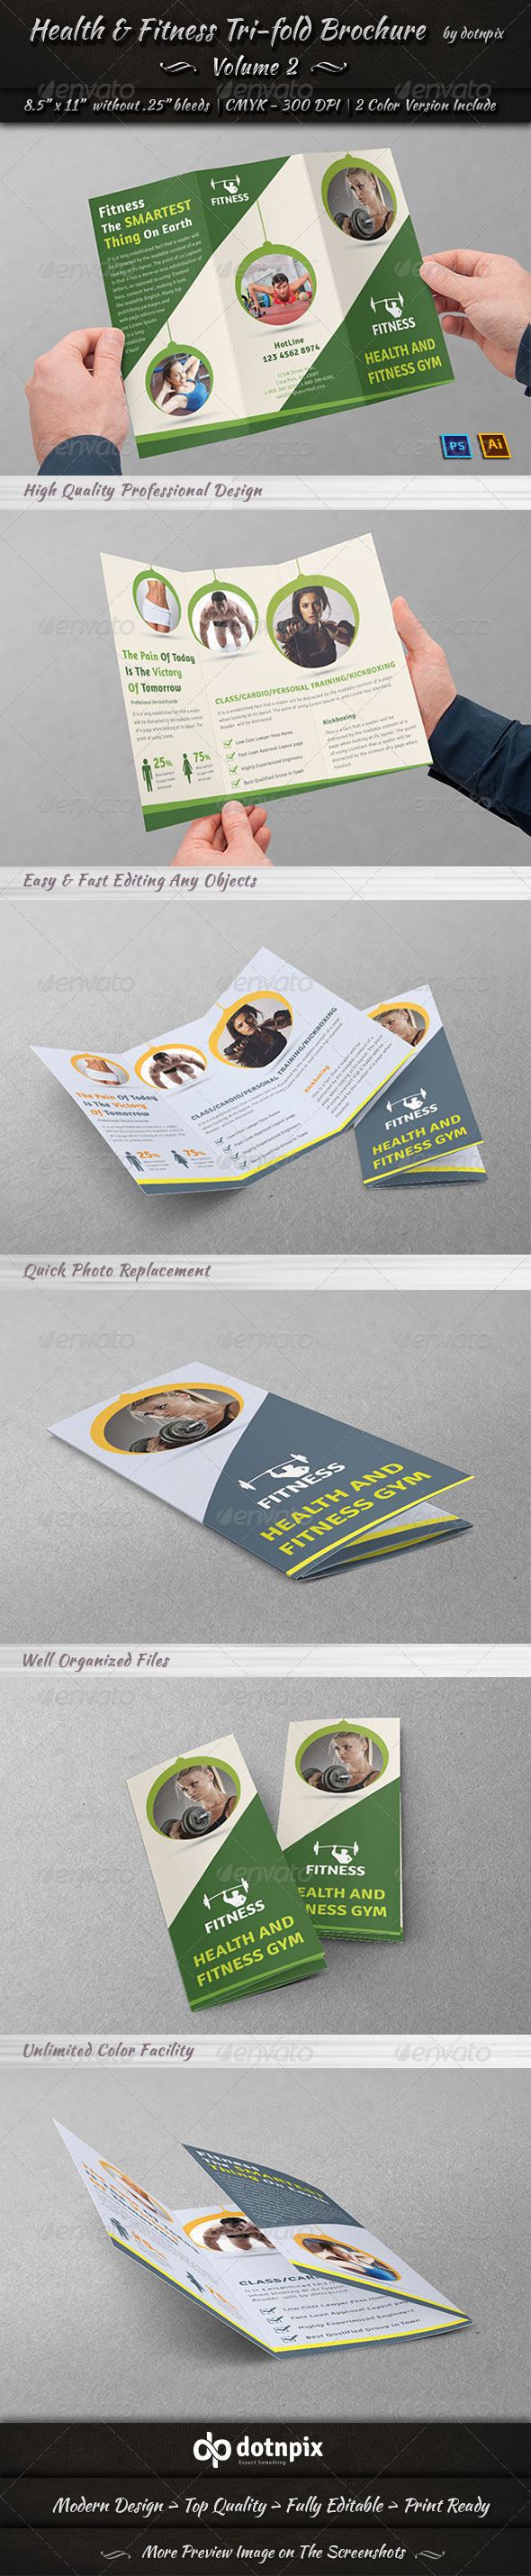 GraphicRiver Health & Fitness Tri-Fold Brochure Volume 2 7720620